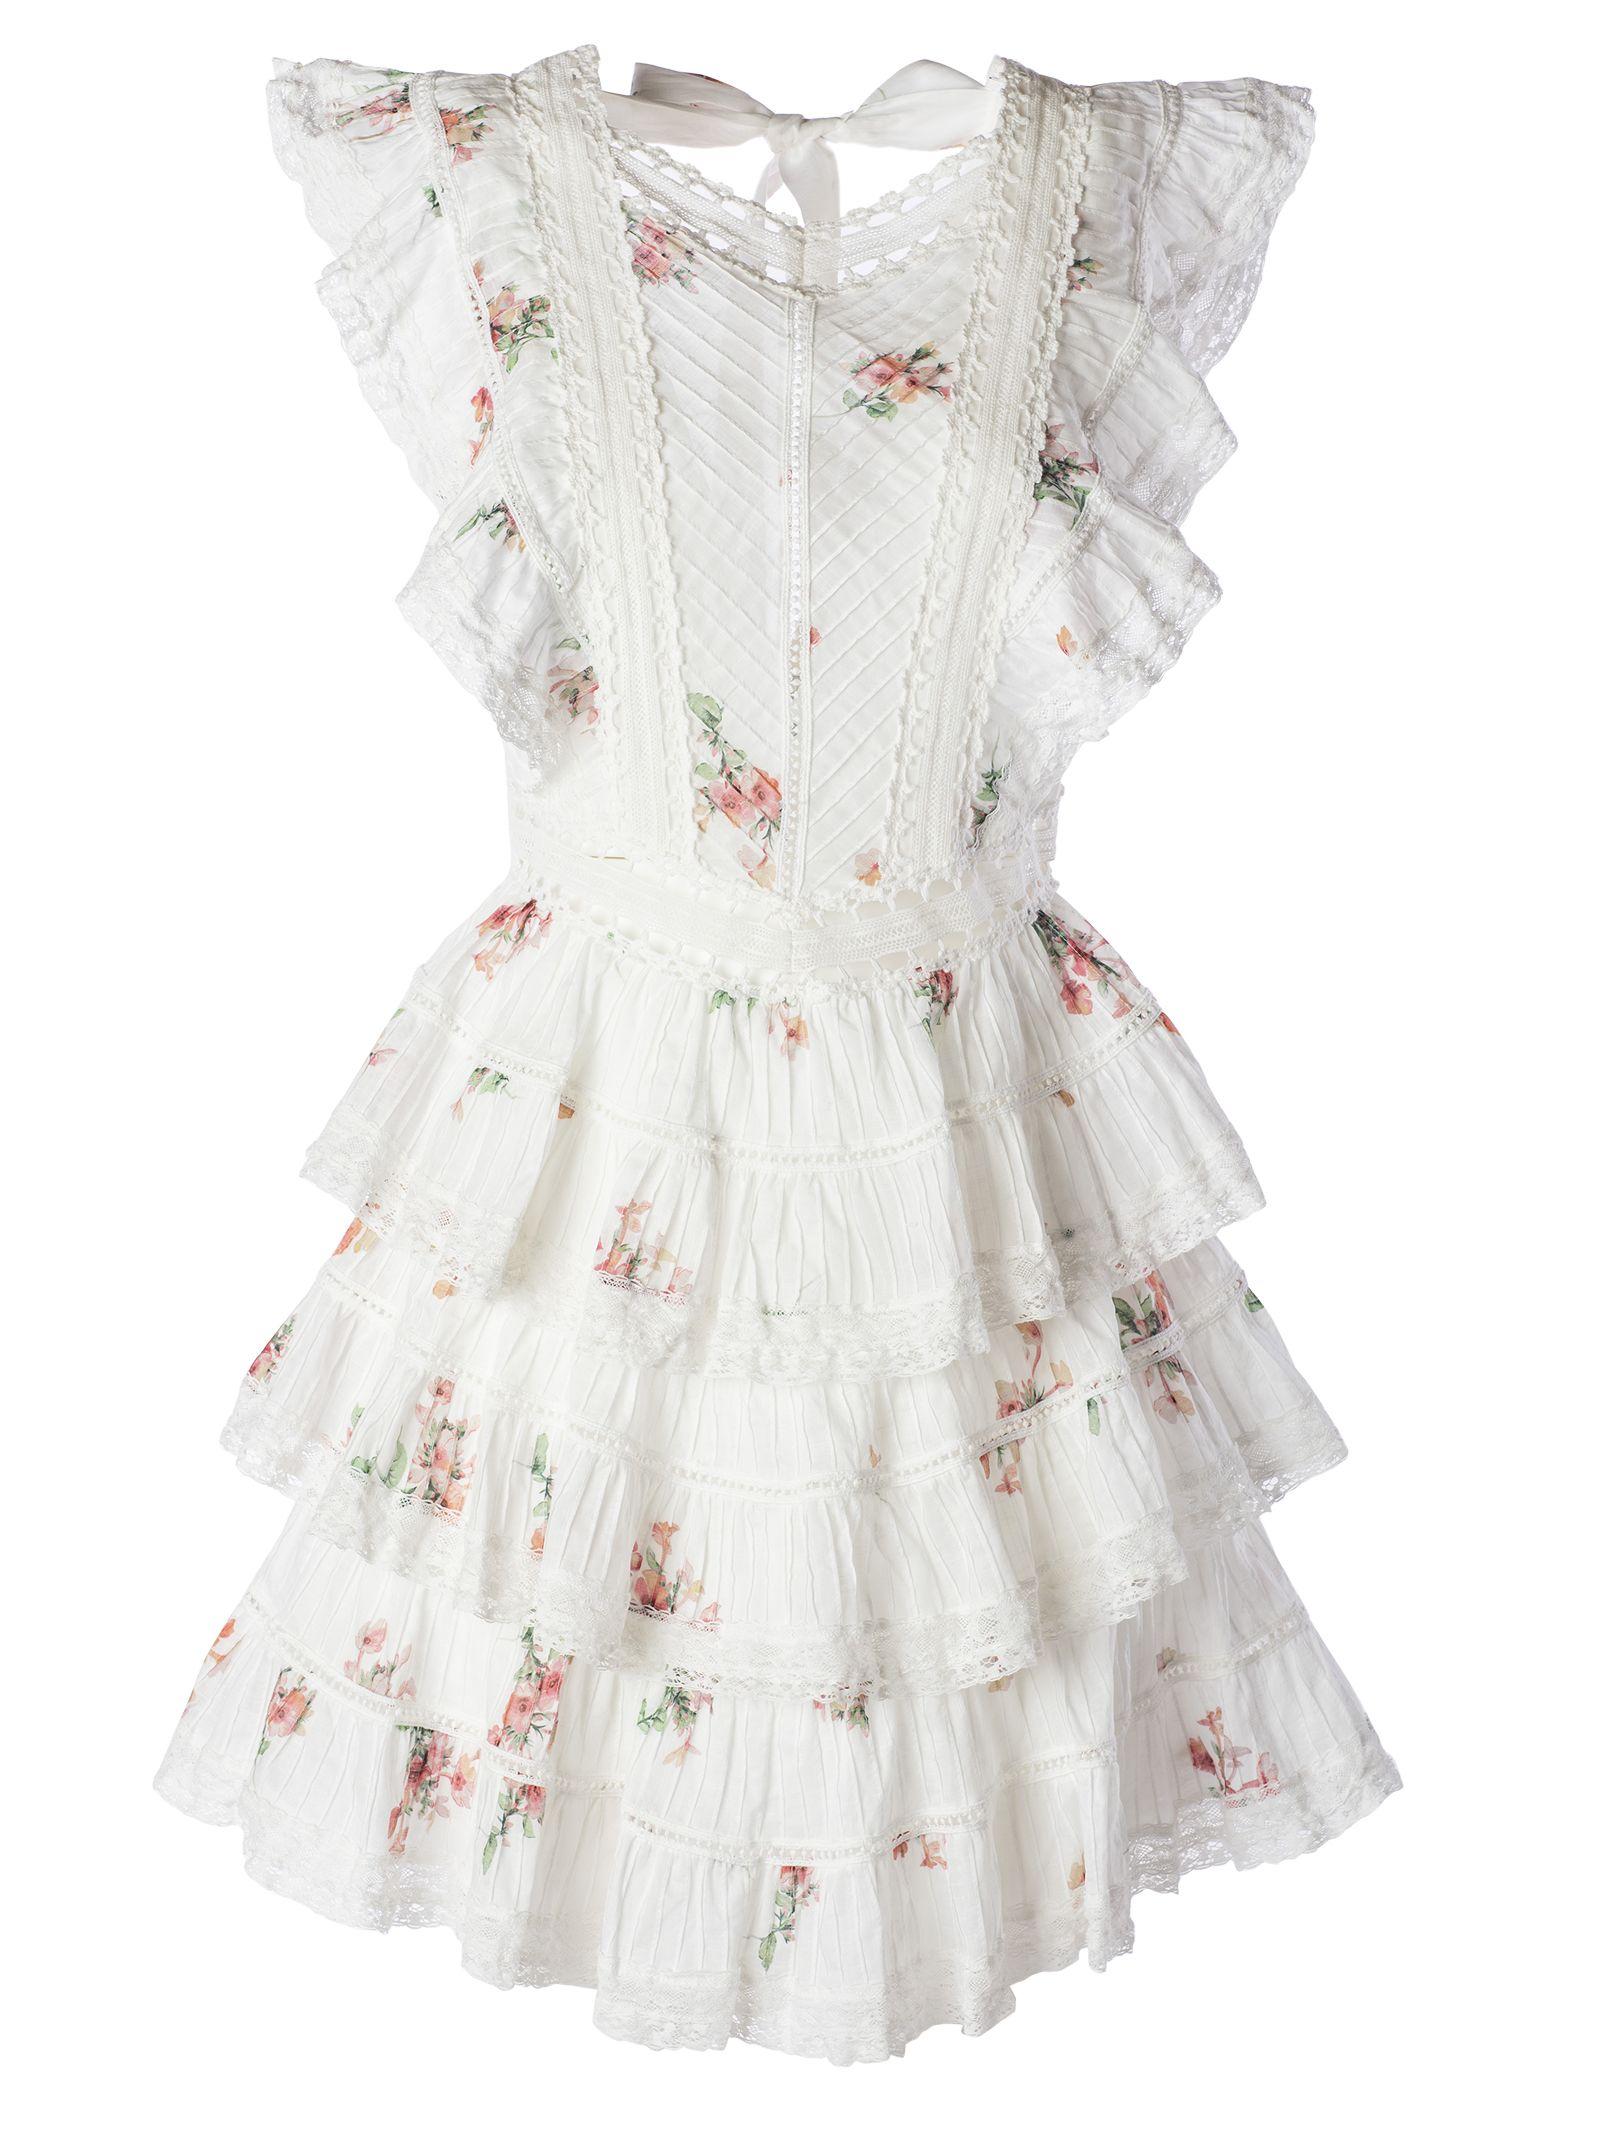 8ab11a76a8876 Zimmermann Zimmermann Heather Pintuck Dress - White - 10840792 | italist